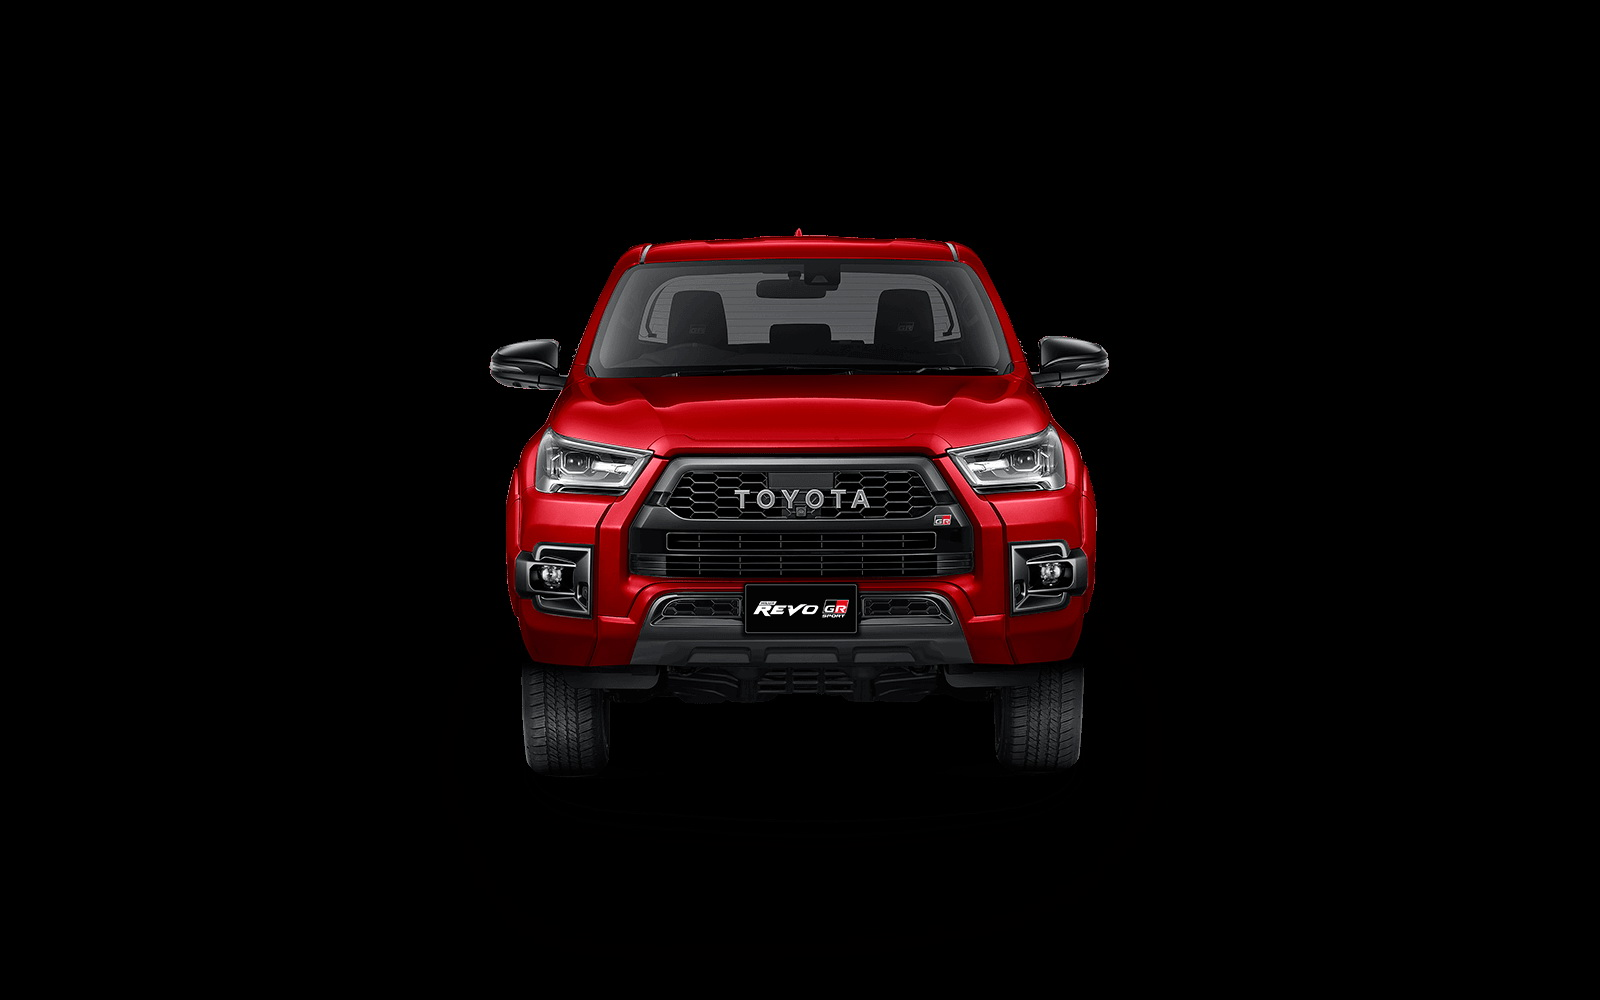 Toyota-Hilux-Revo-GR-Sport-18